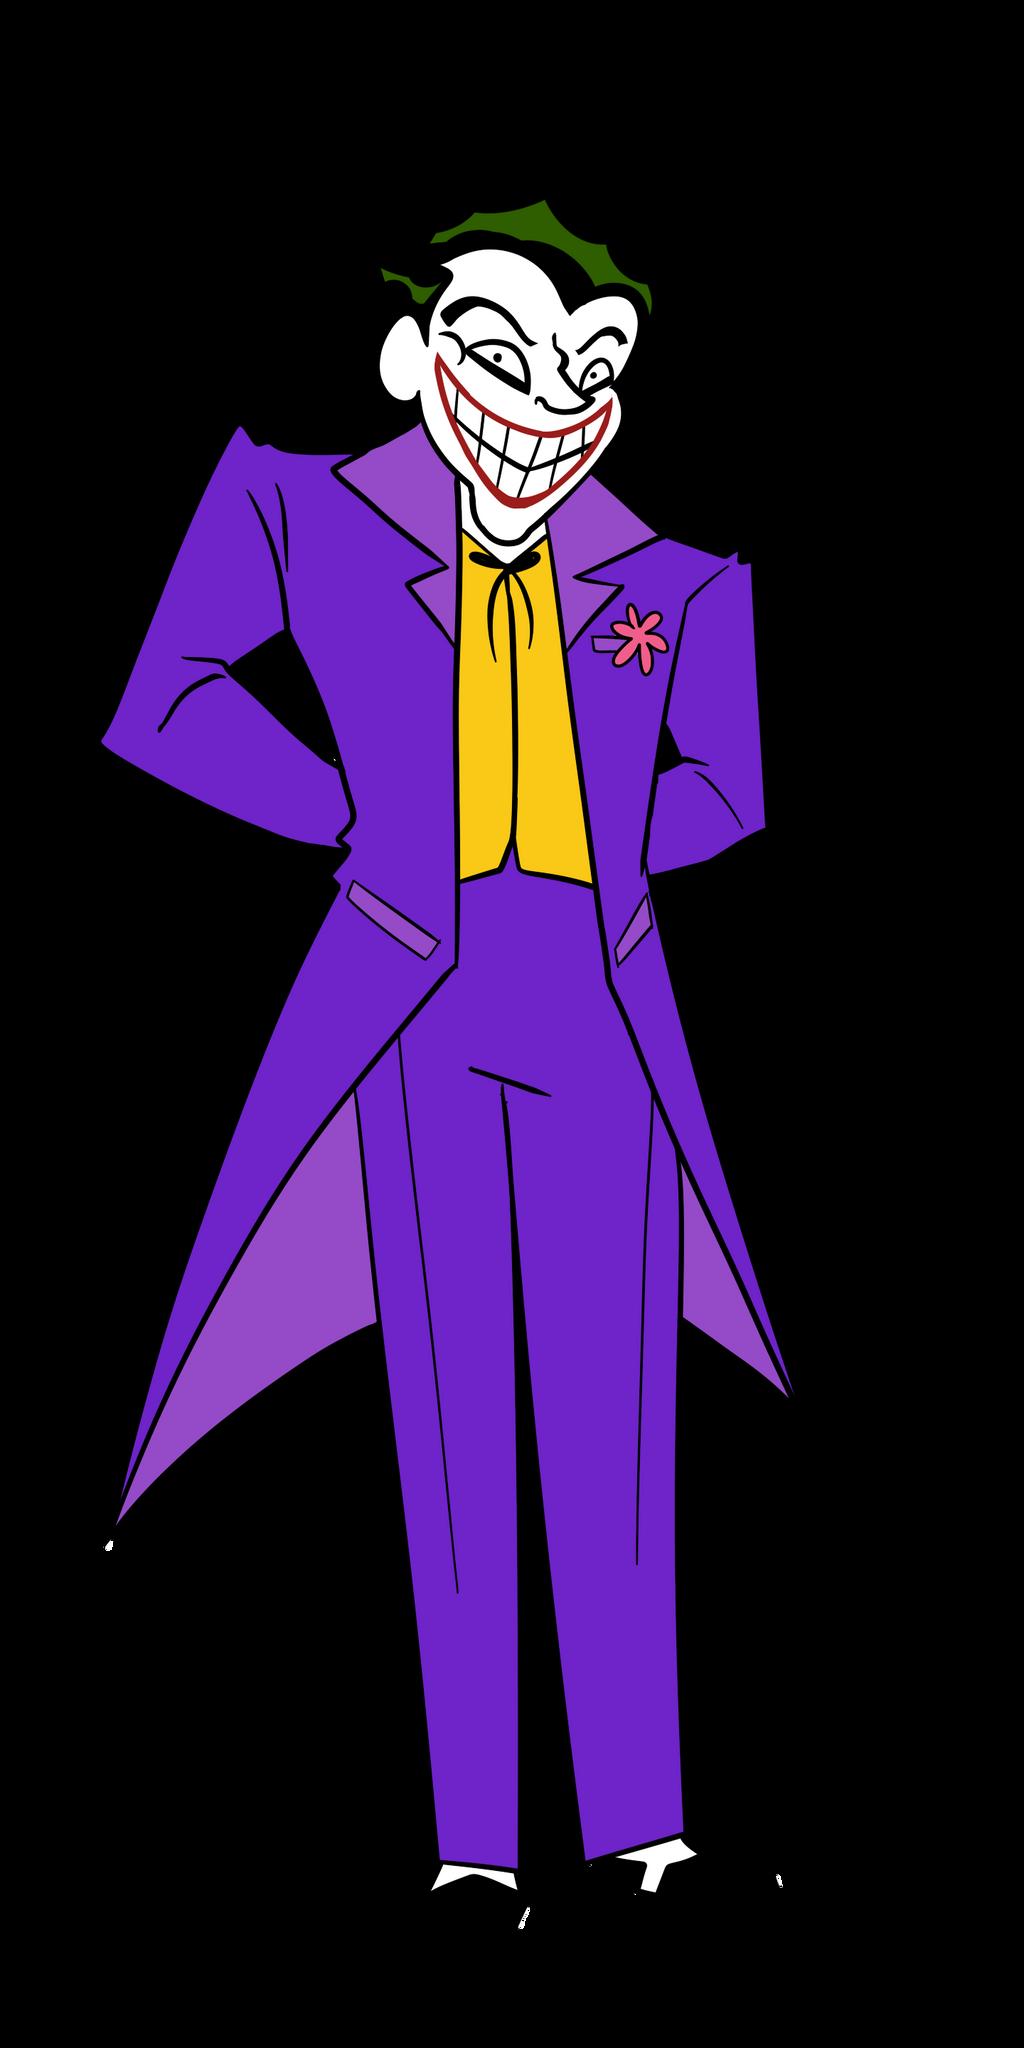 Quick Draw Joker By Squeezybat On Deviantart